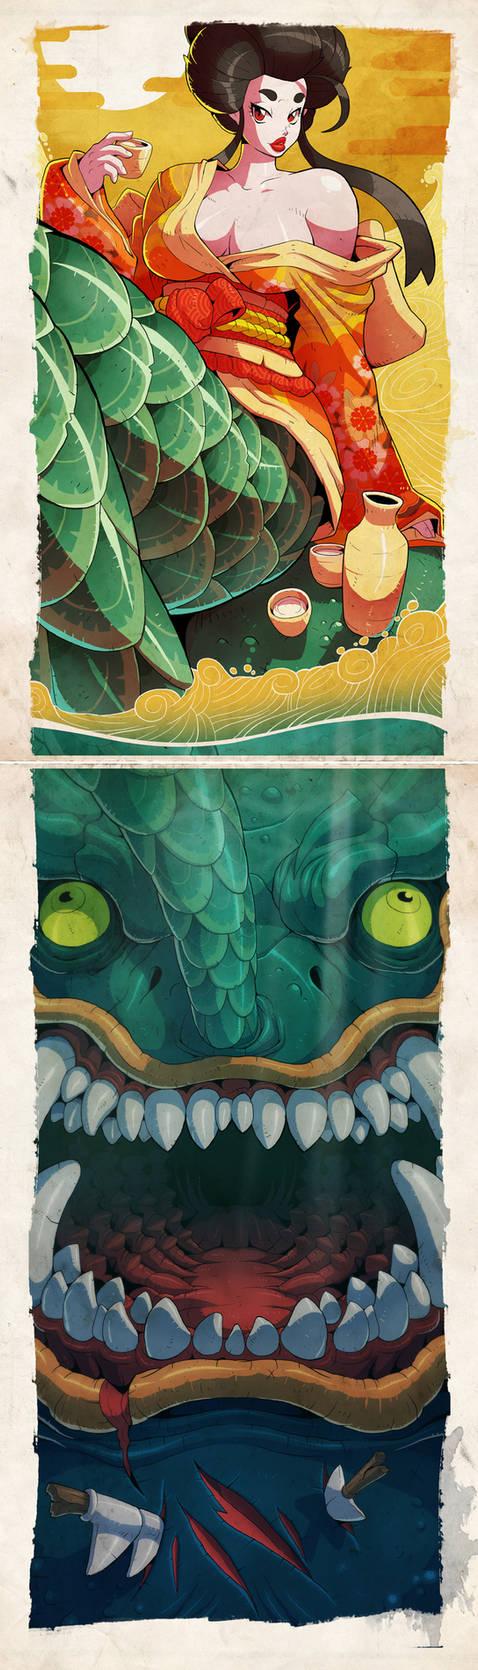 Don't Trust Mermaids